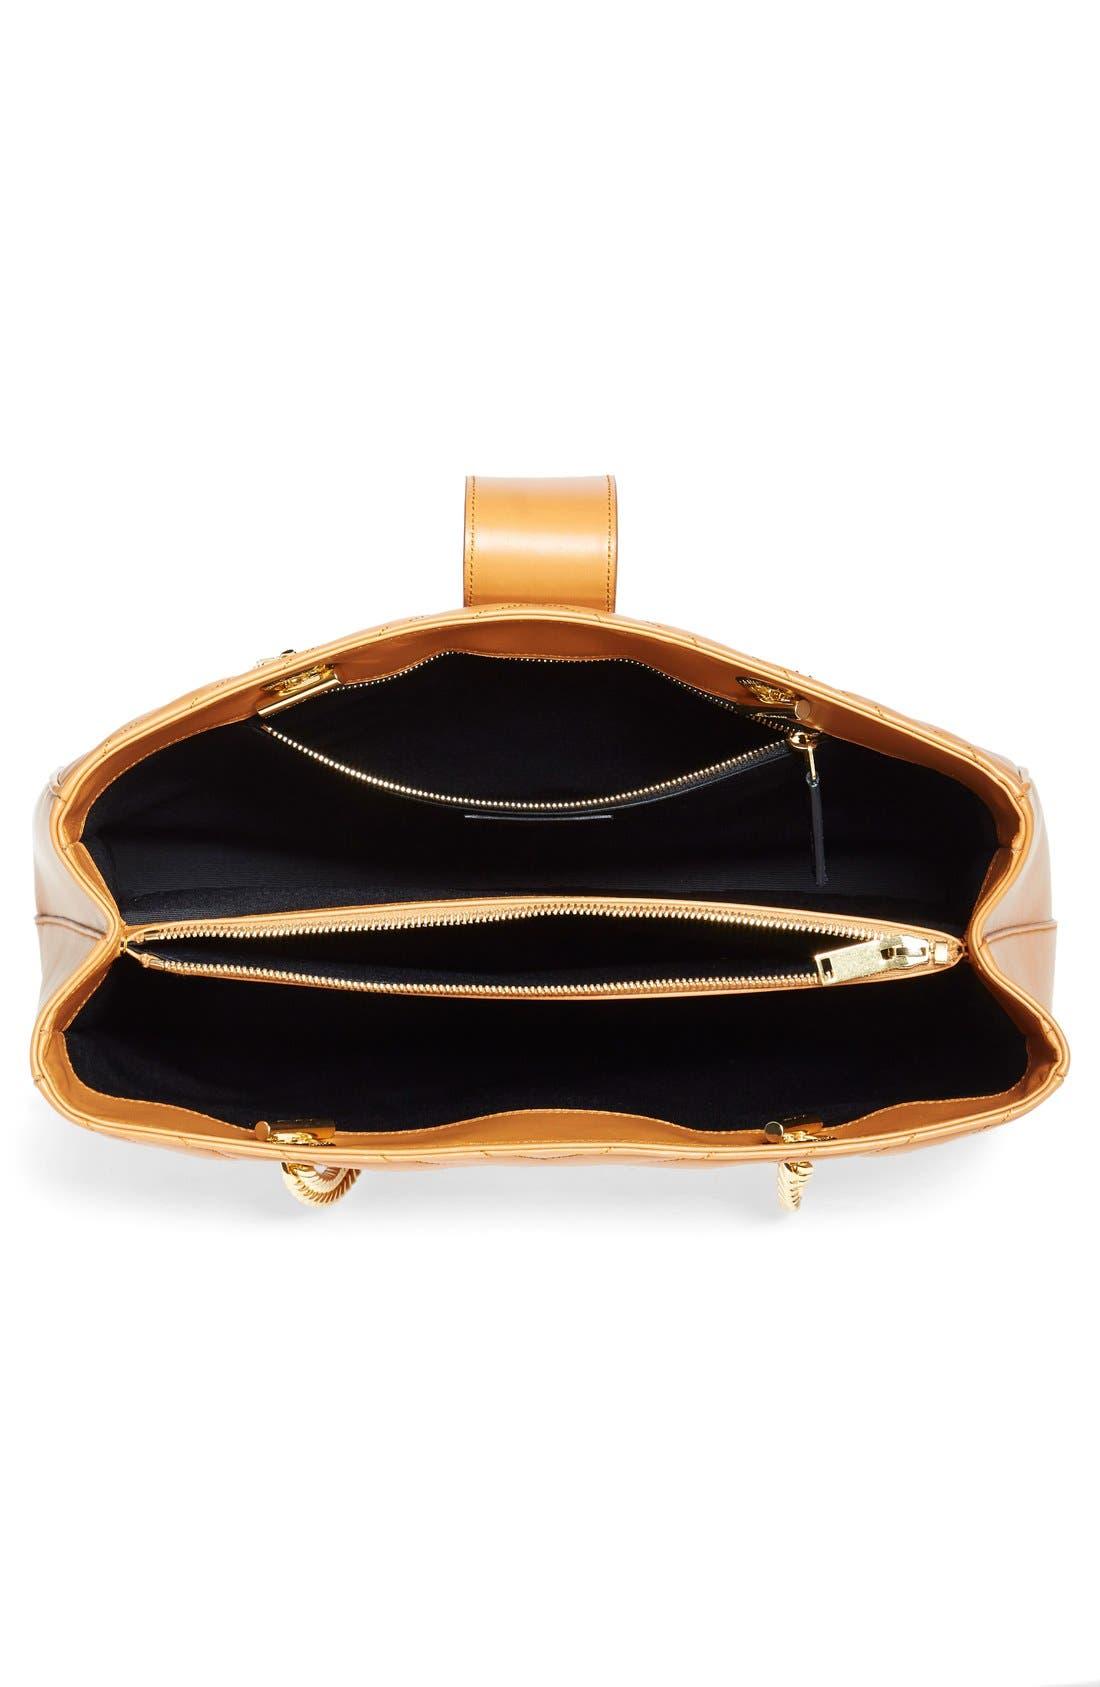 Alternate Image 3  - Saint Laurent 'Cassandre' Leather Shopper